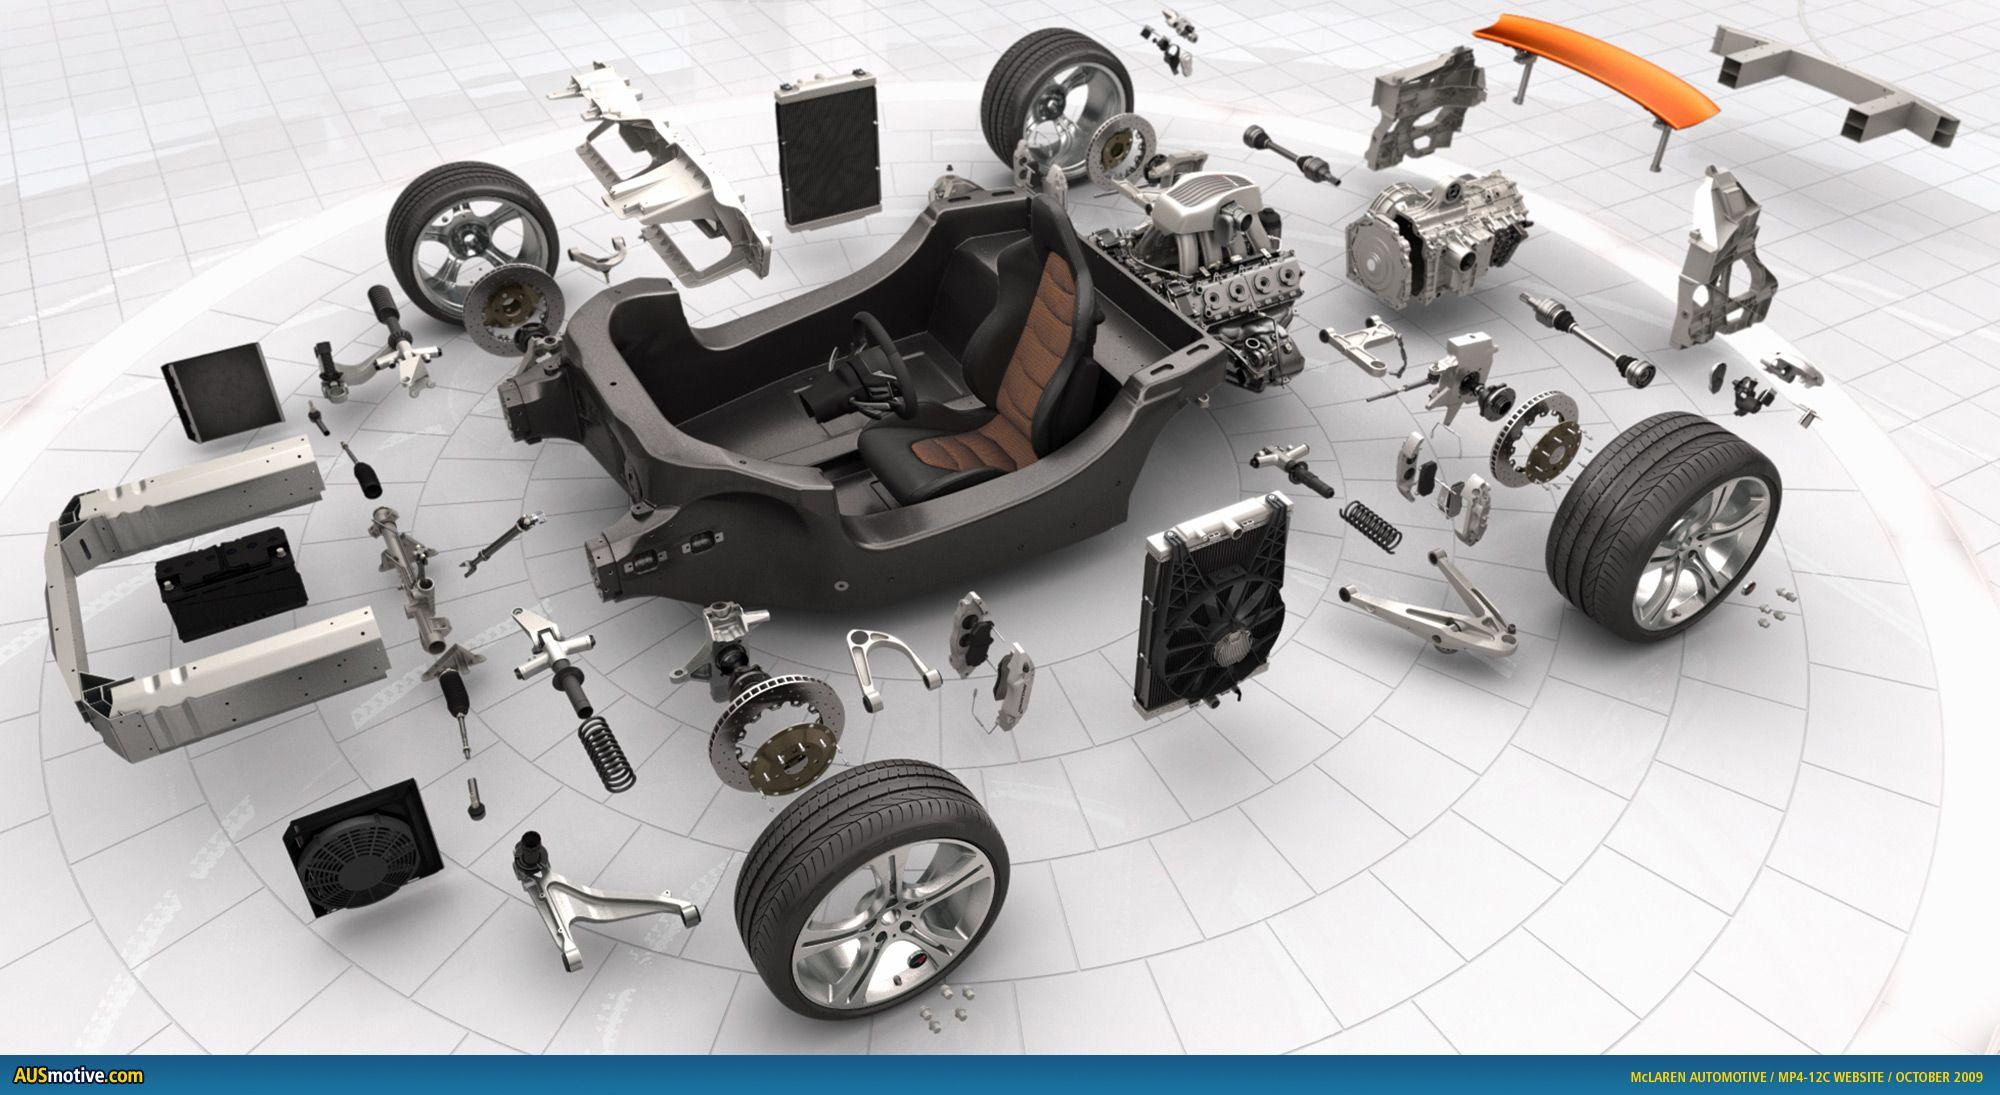 McLaren MP4-12c Exploded View | Dream Cars | Pinterest | Mp4 12c ...